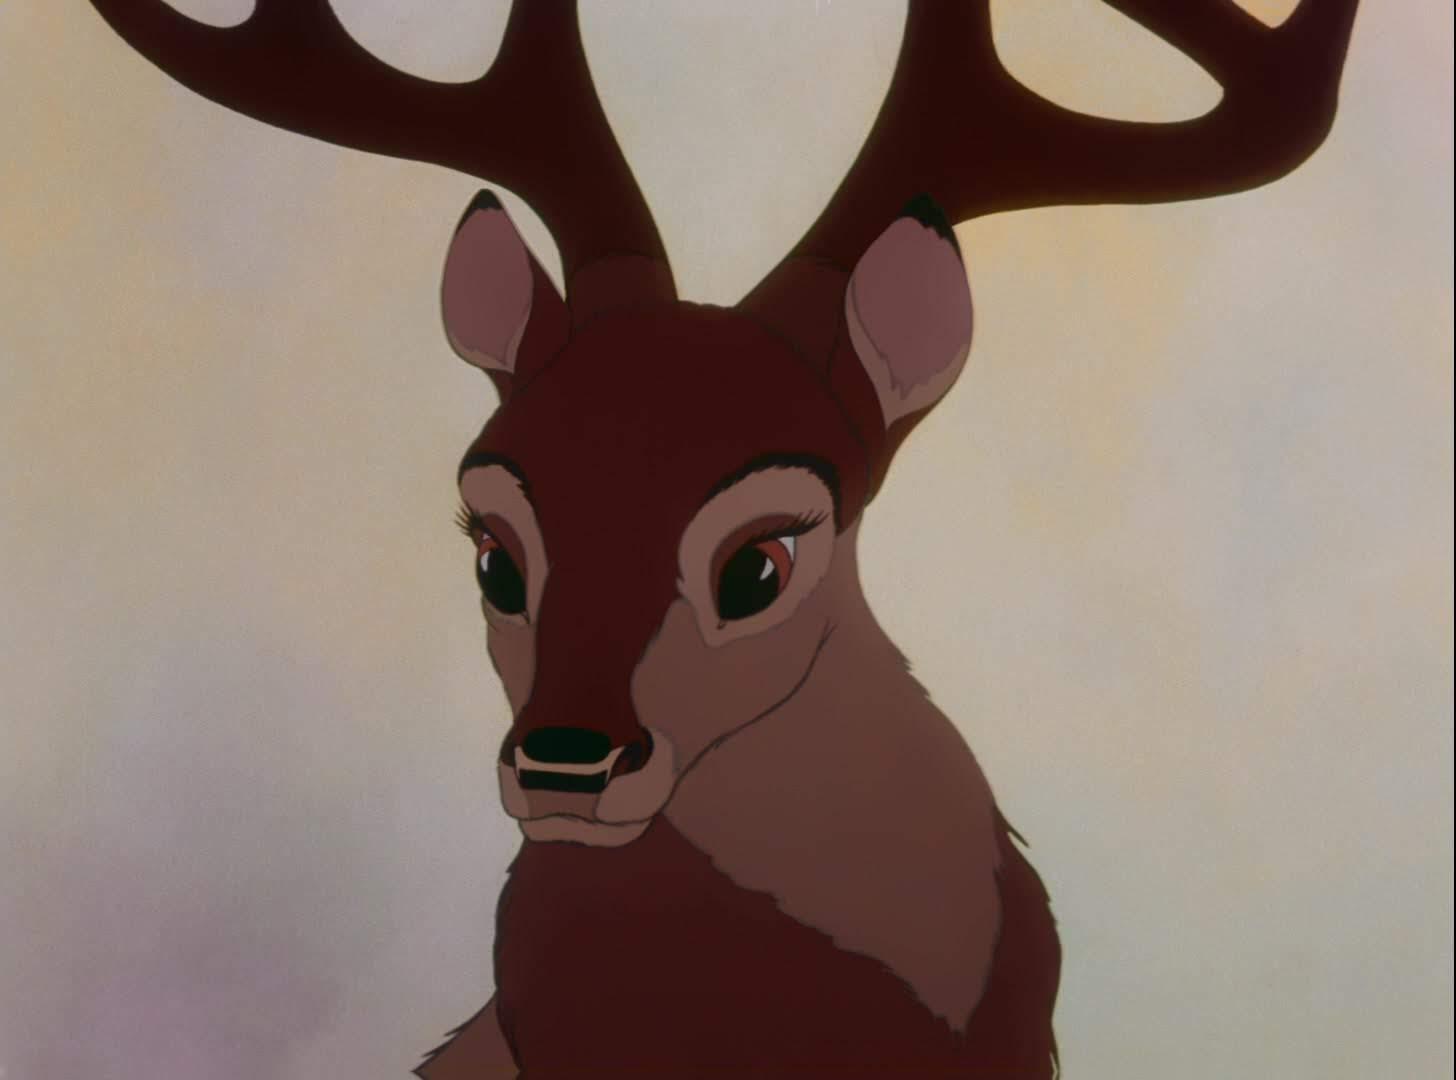 Bambi_great-prince-e1322923400237.jpg